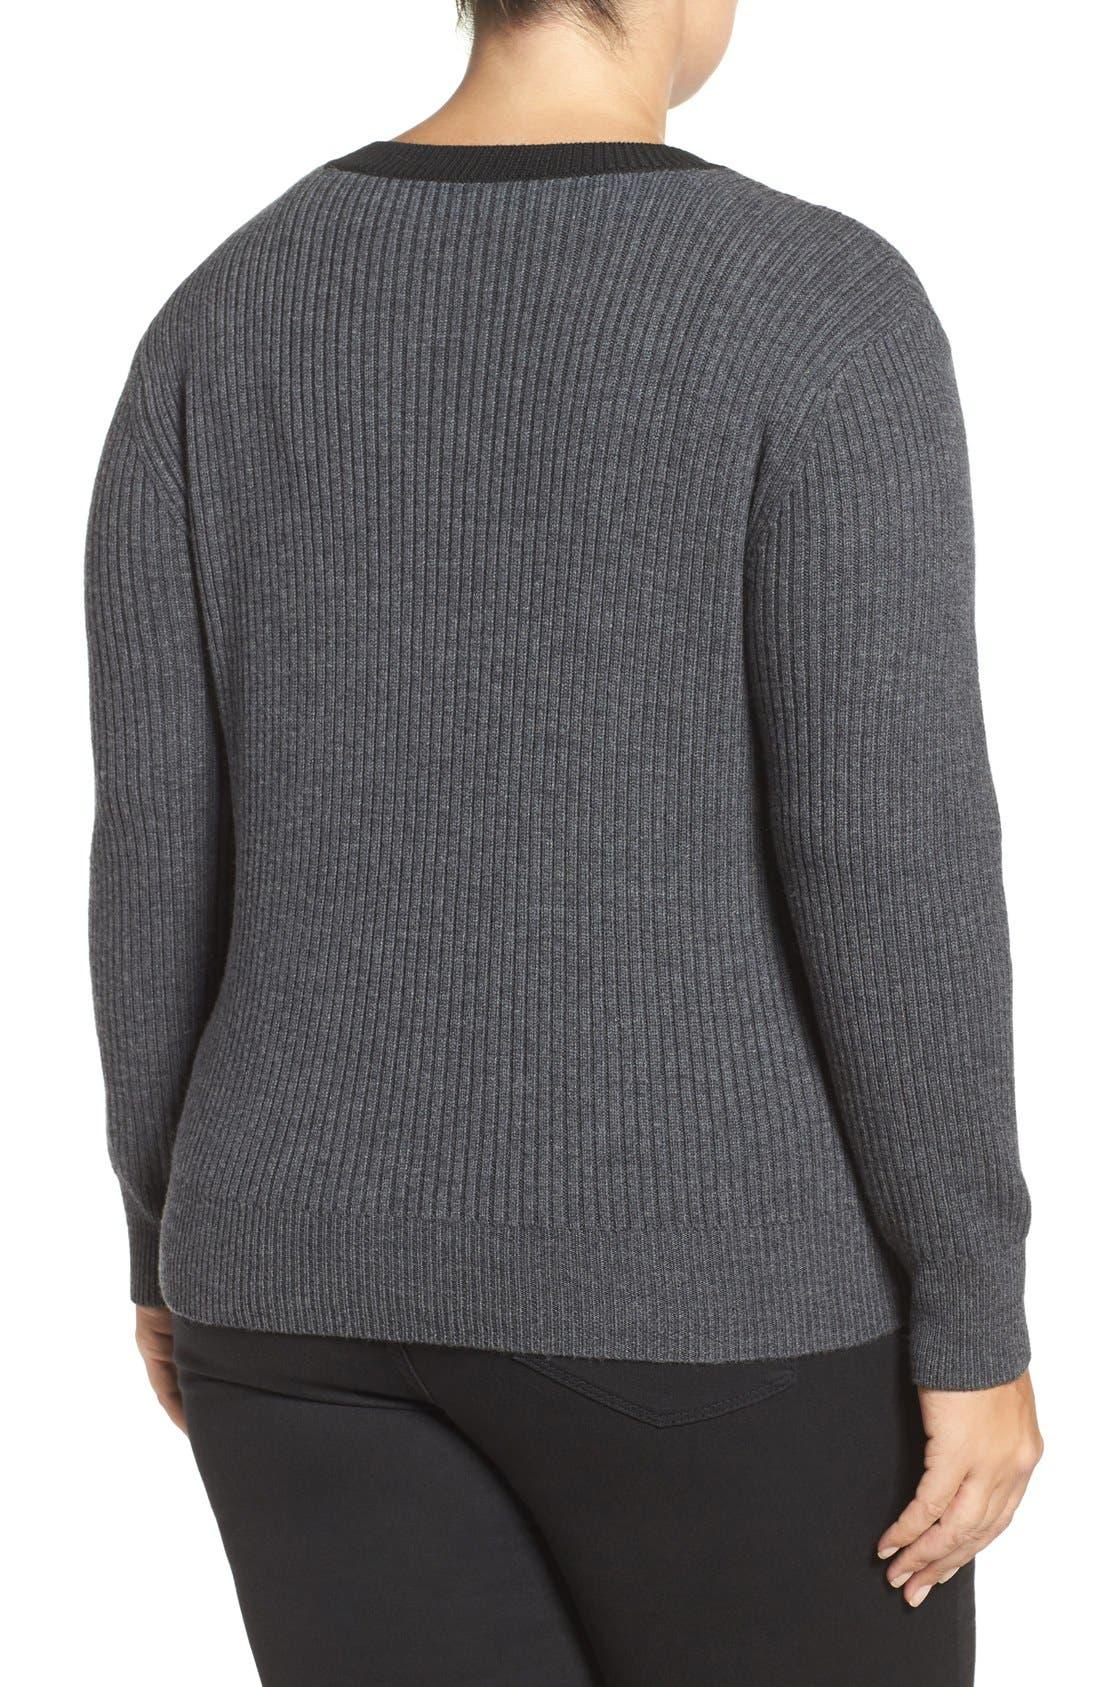 Alternate Image 2  - Tart Amity Lace-Up Merino Sweater (Plus Size)